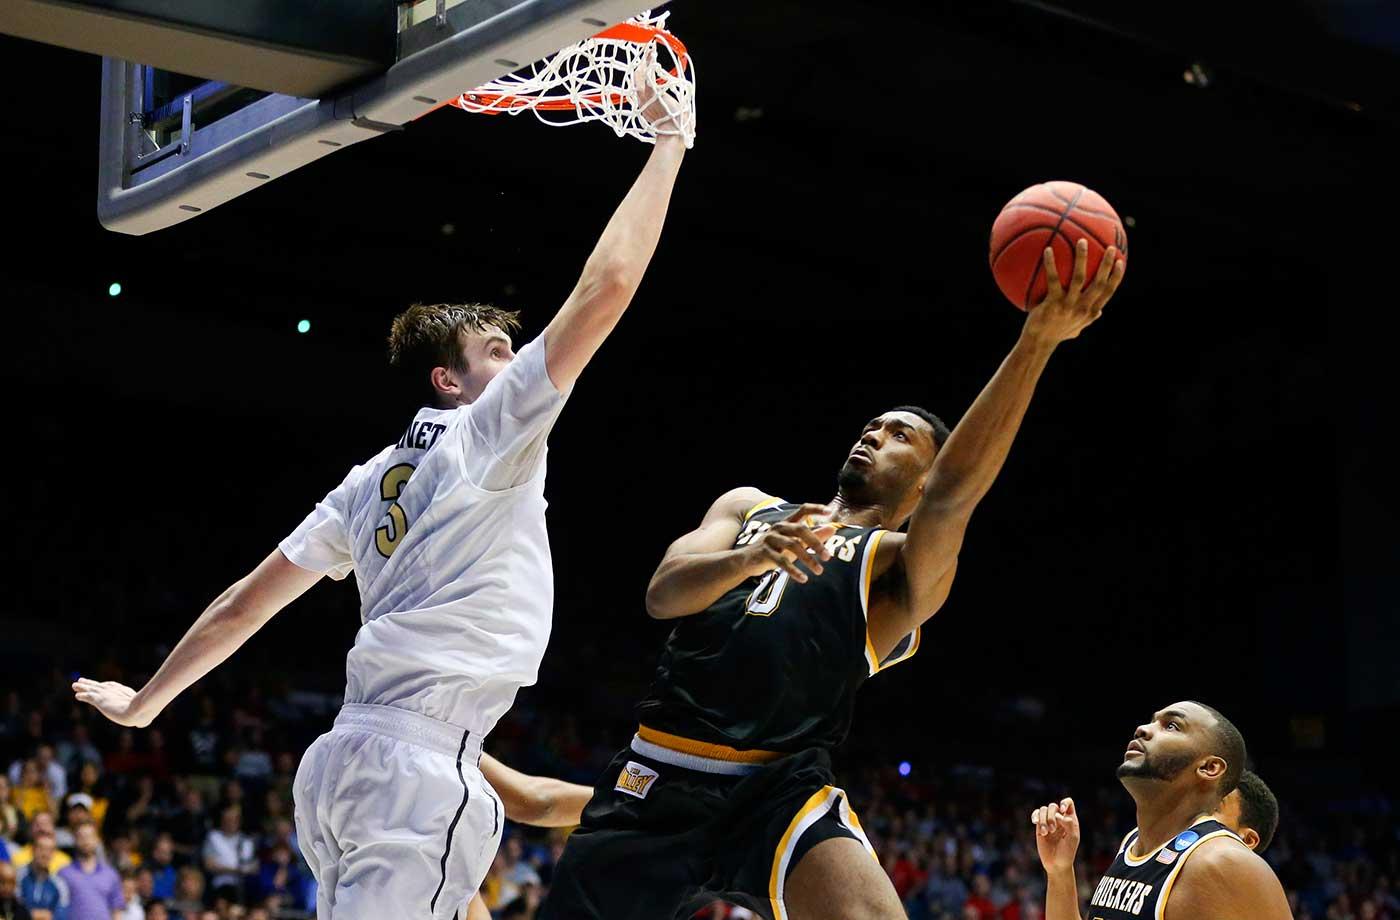 Wichita State's Rashard Kelly goes to the basket against Vanderbilt's Luke Kornet.